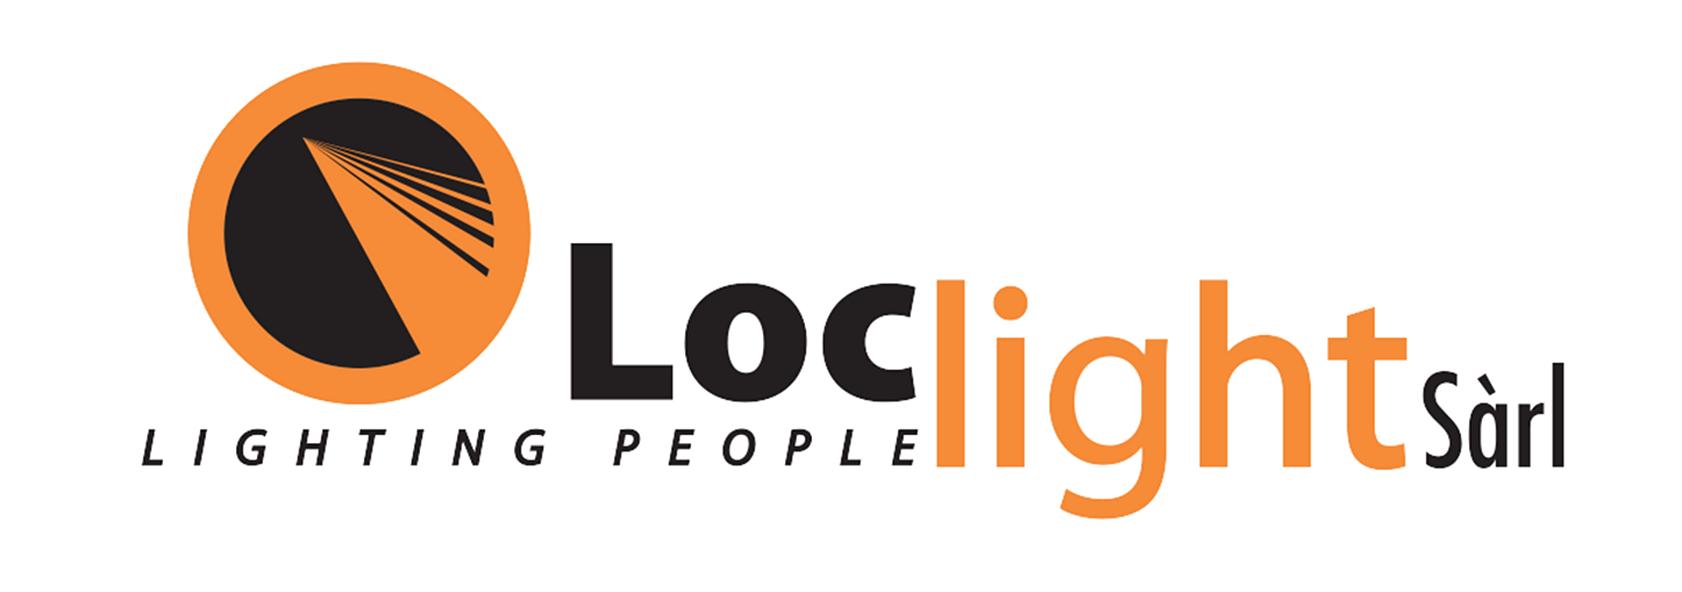 Loc Light Sàrl